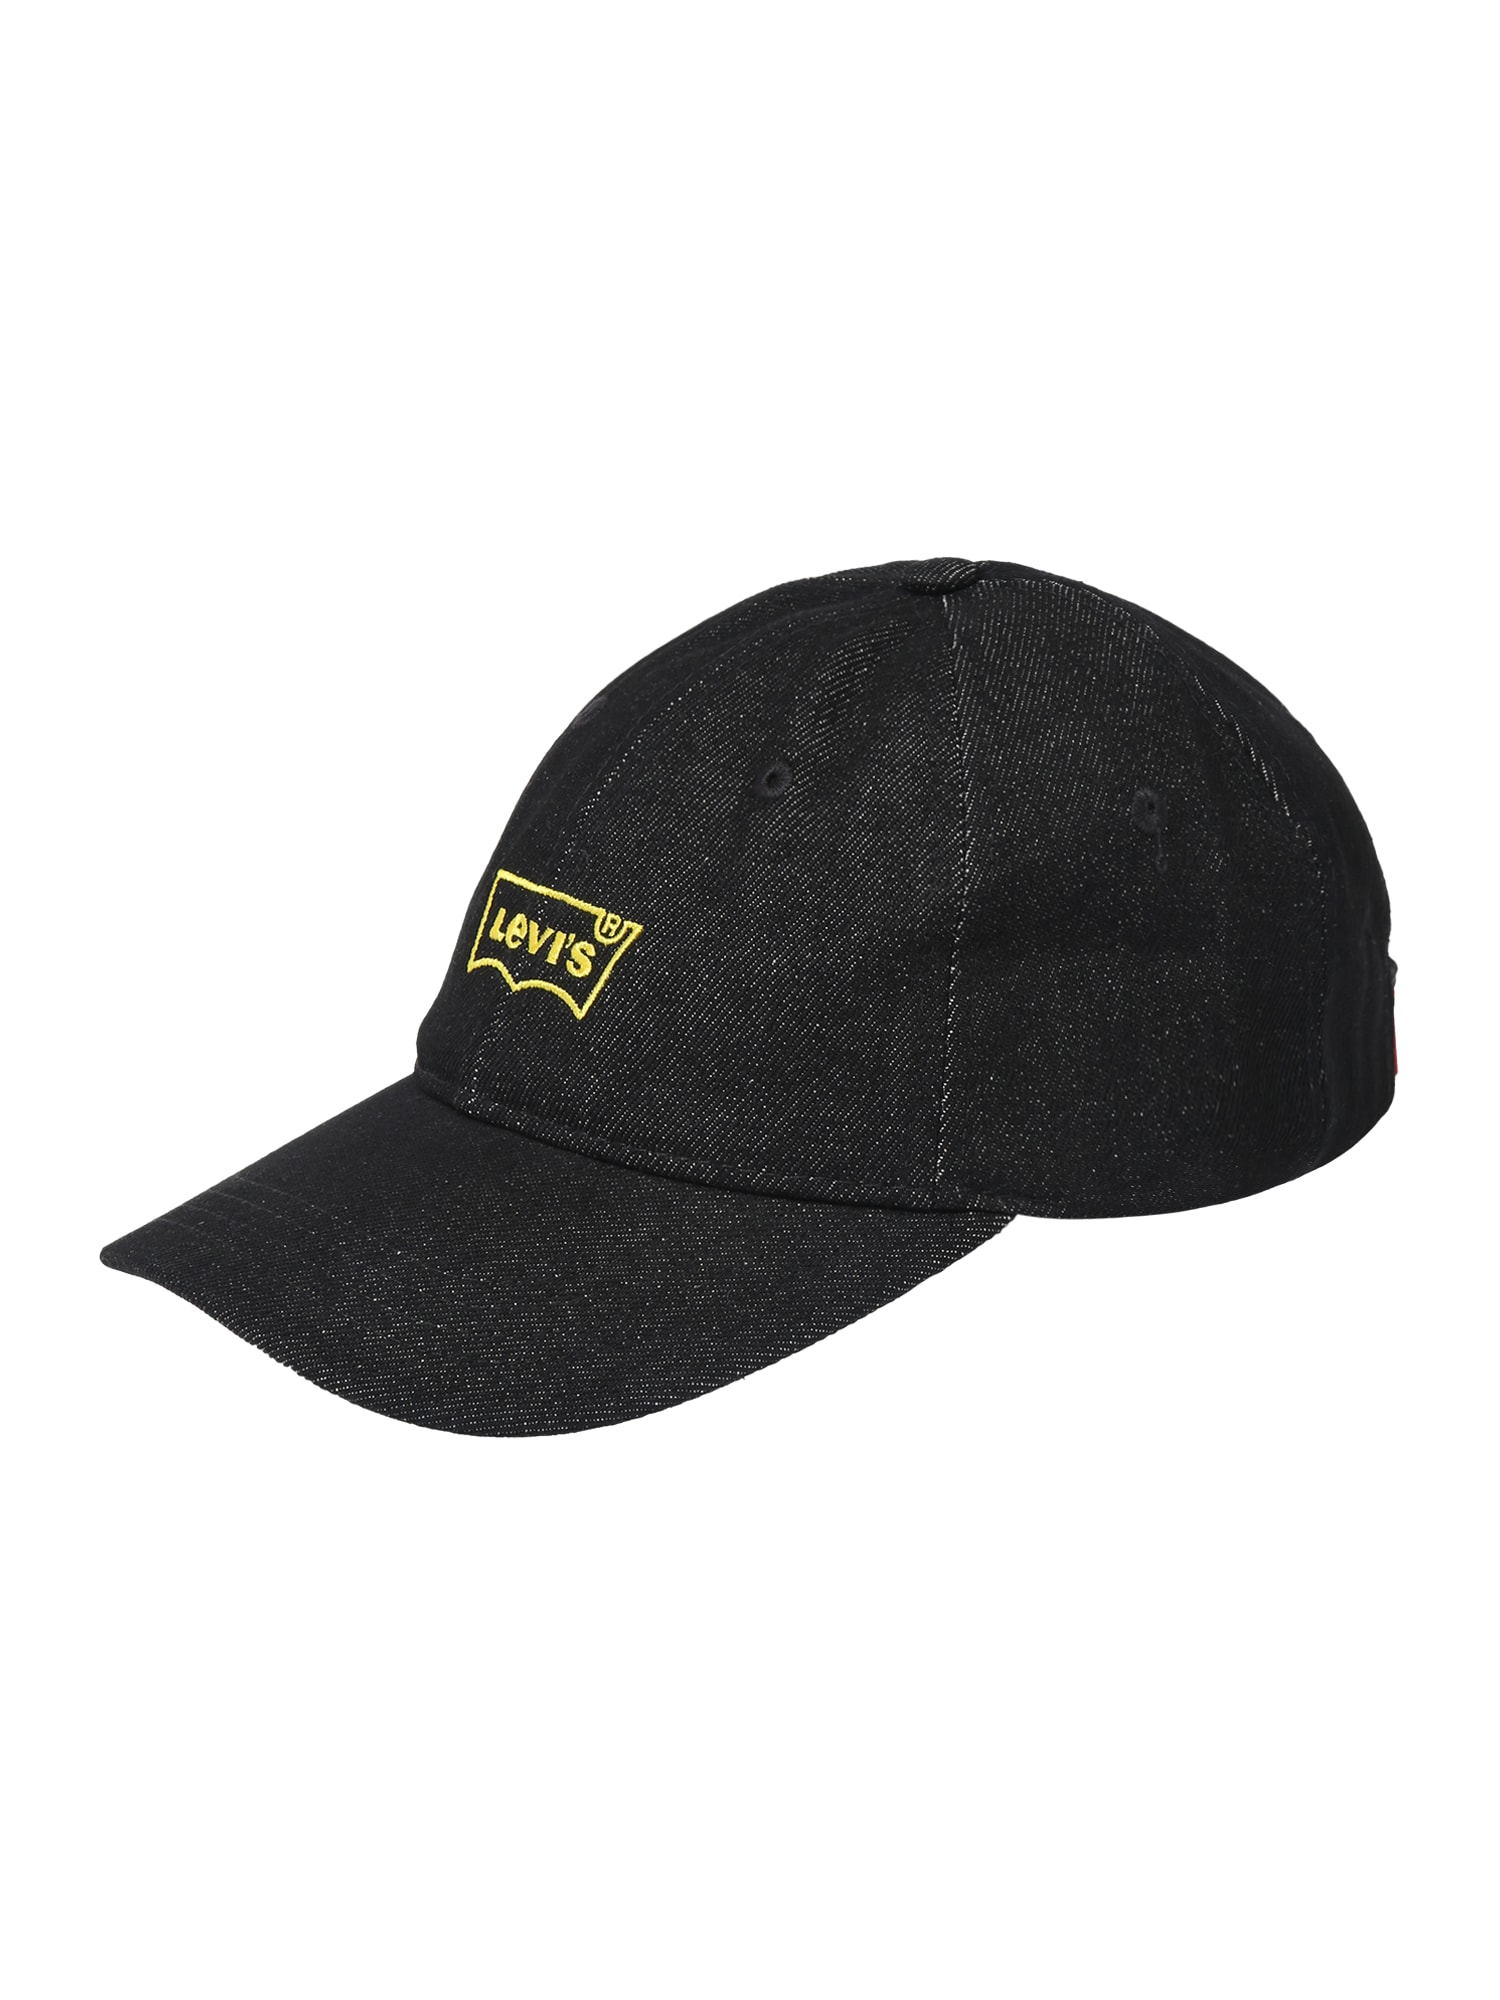 LEVI'S Kepurė 'LEVI'S STAR WARS CAP' juoda